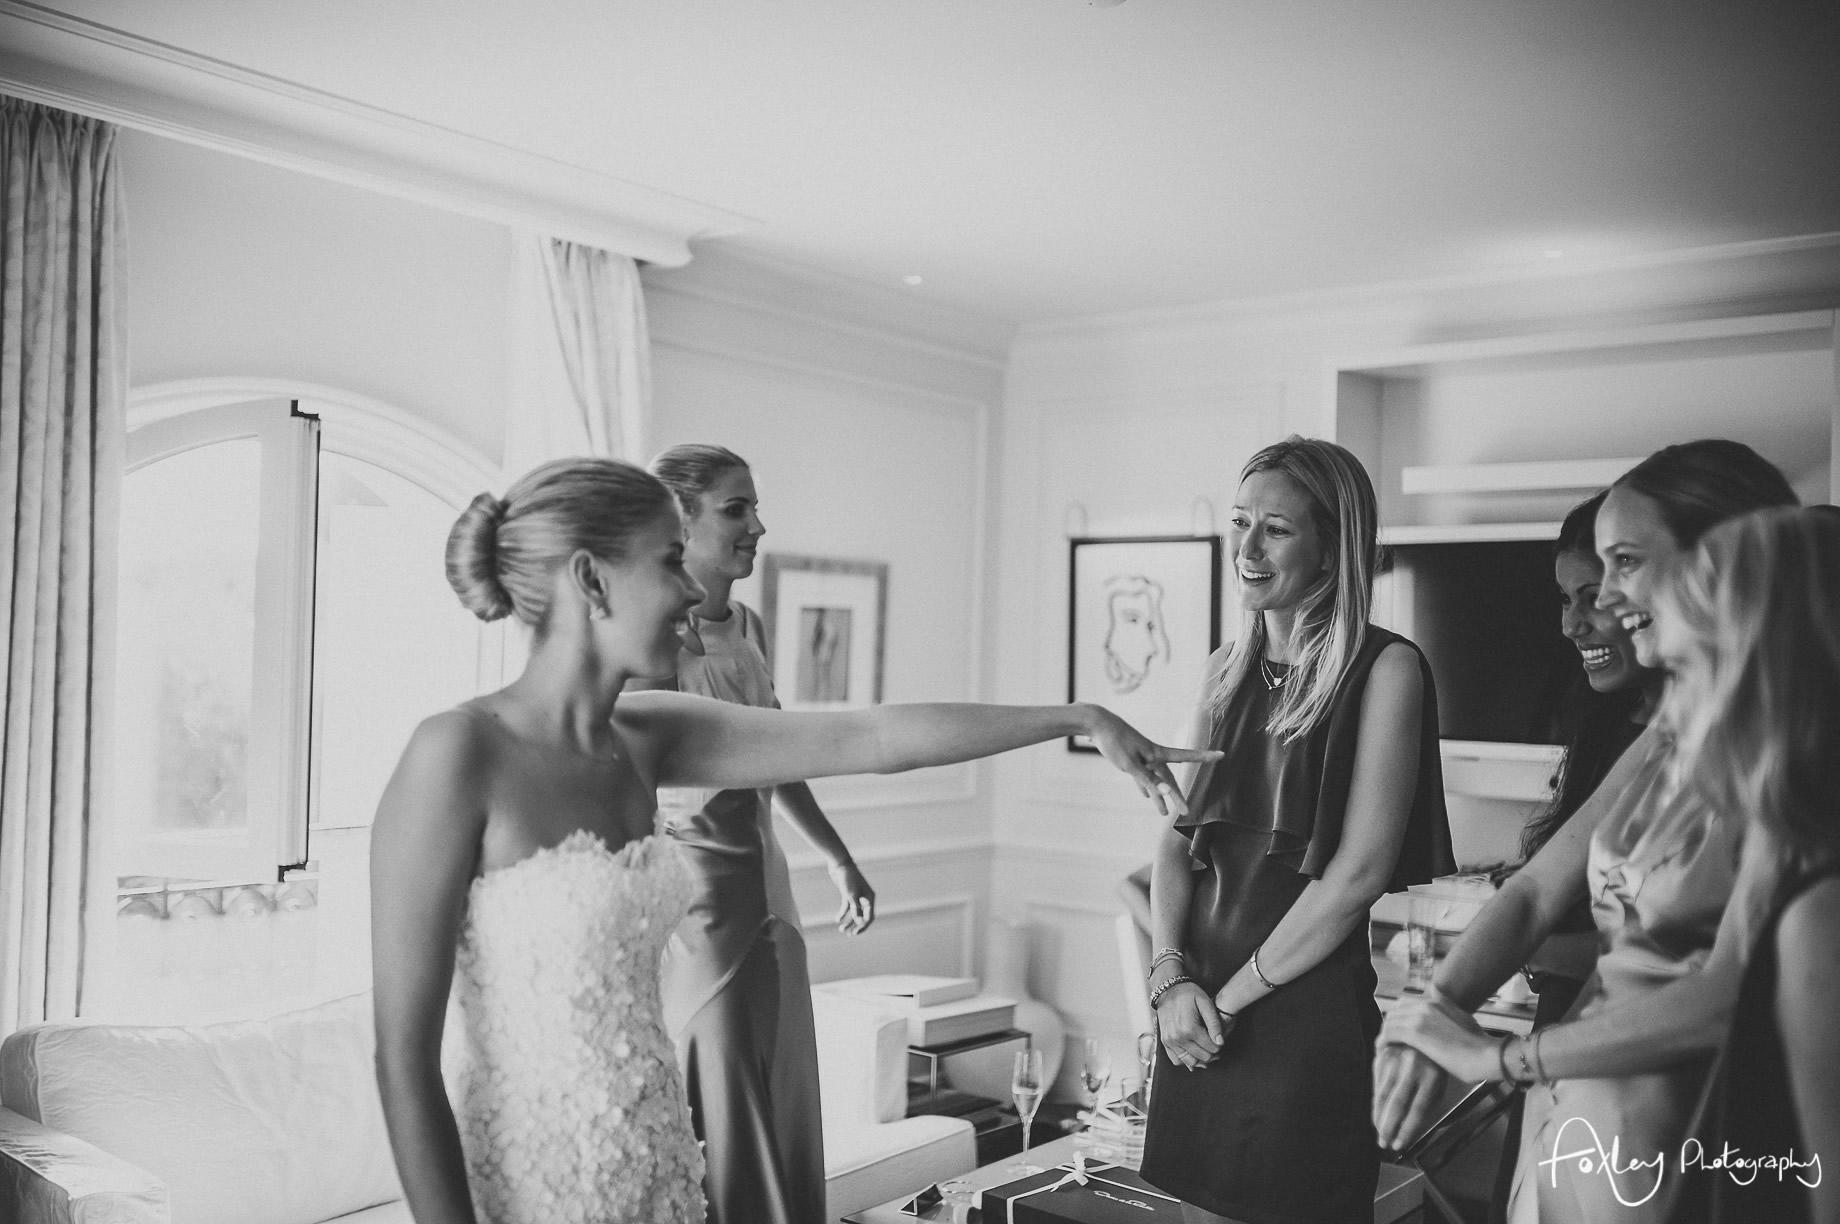 Jil and Will's Wedding at Villa Ephrussi De Rothschild 038